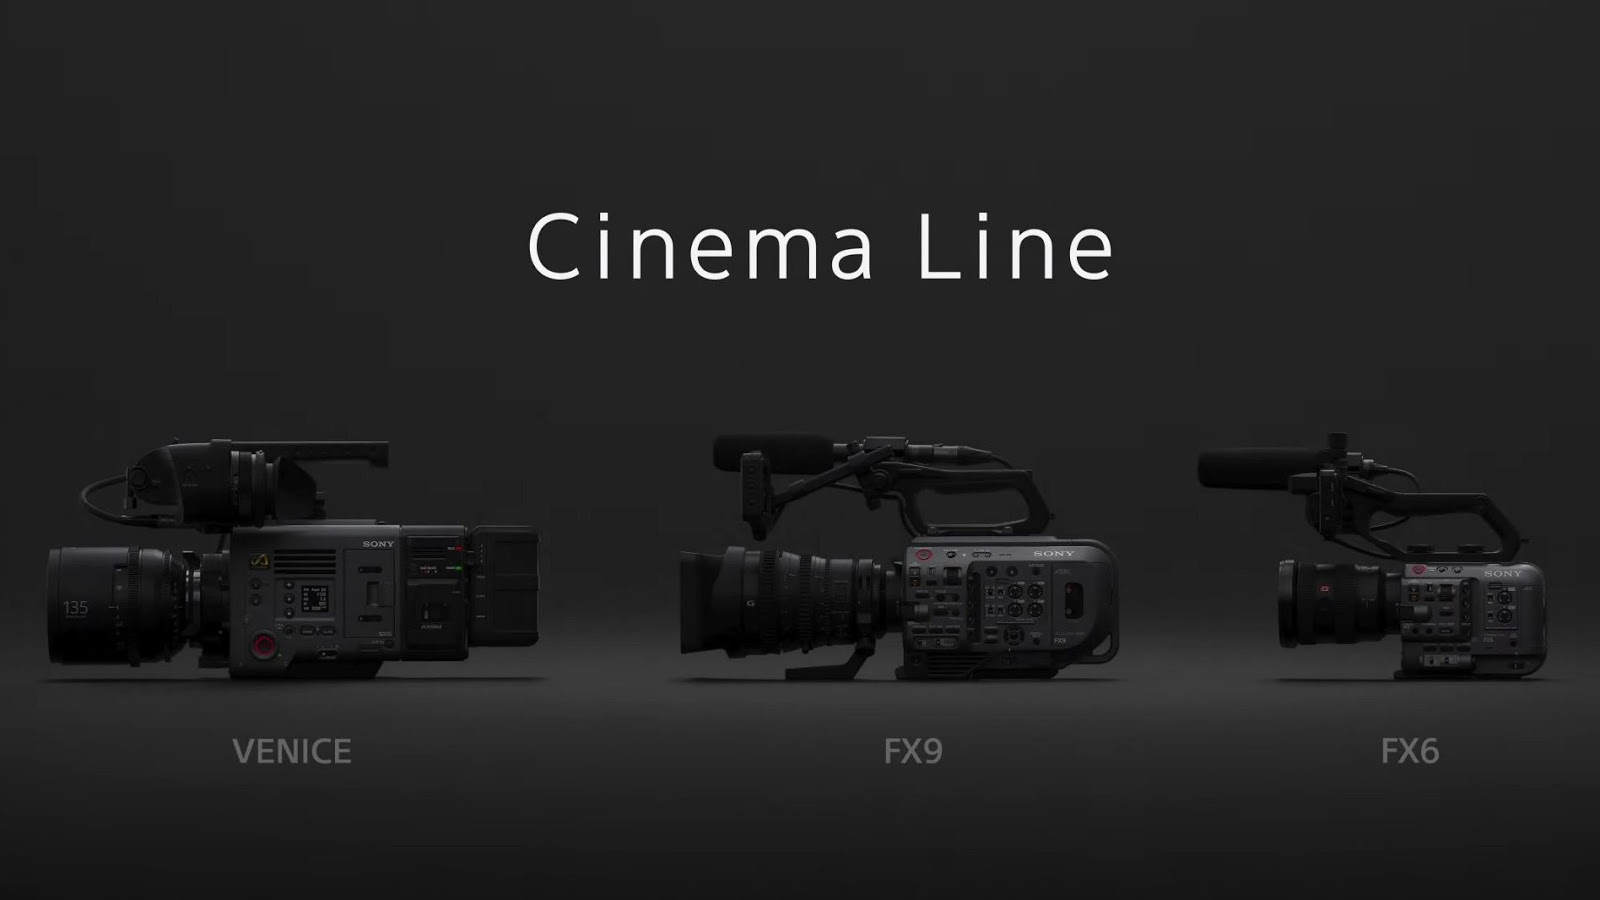 Цифровые кинокамеры Sony